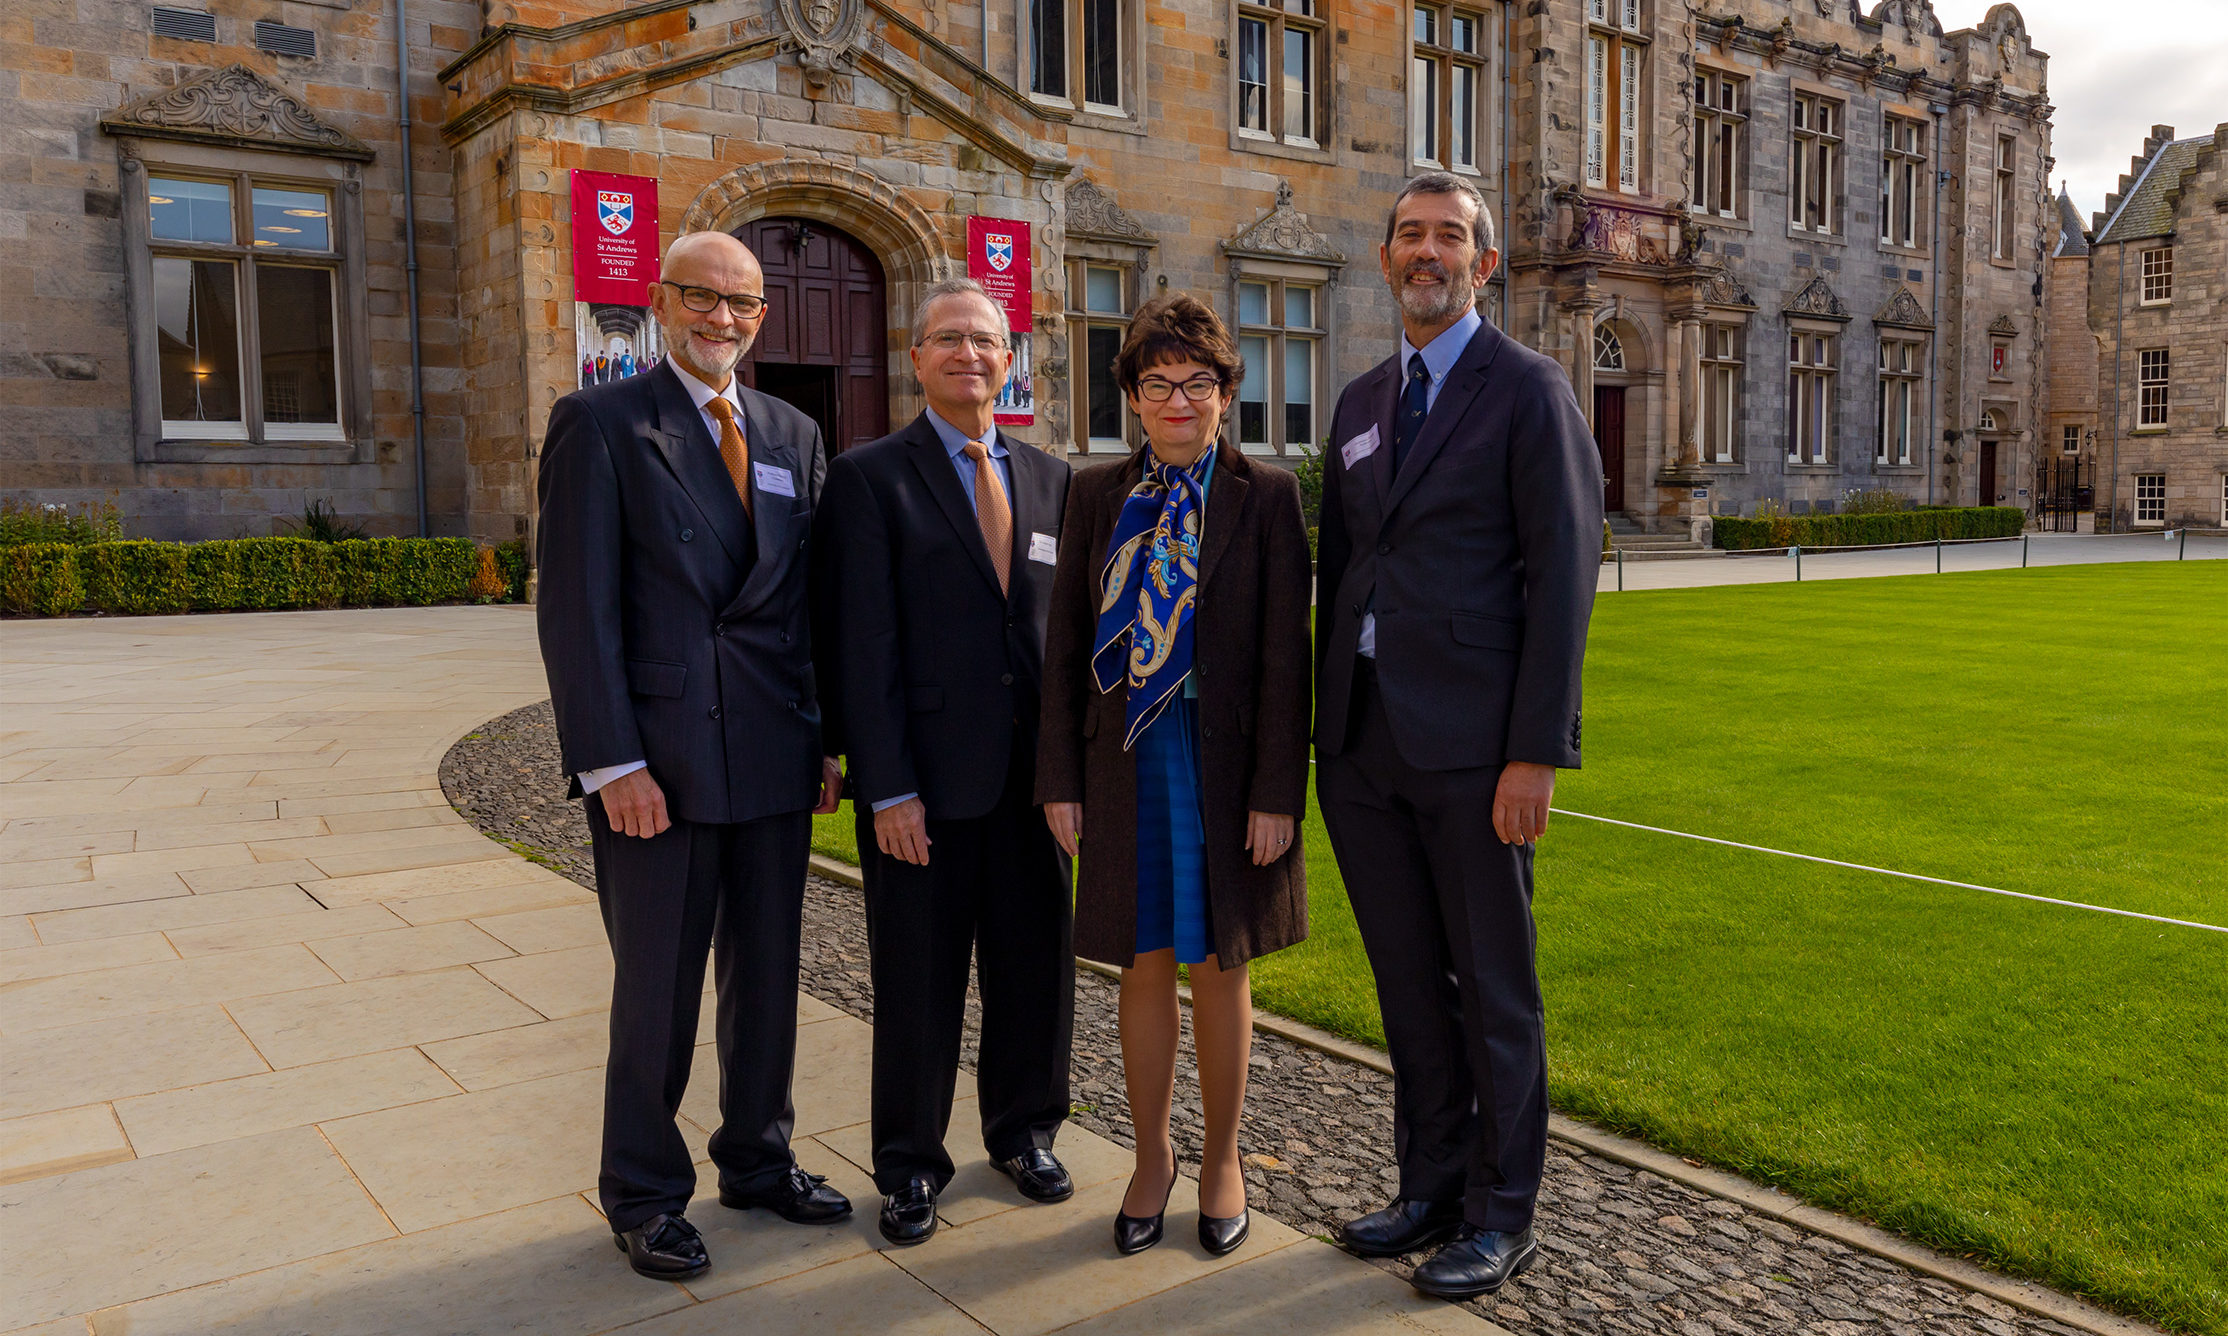 Professor David Crossman, Dr Daniel Levy, Professor Sally Mapstone, Professor Frank Sullivan